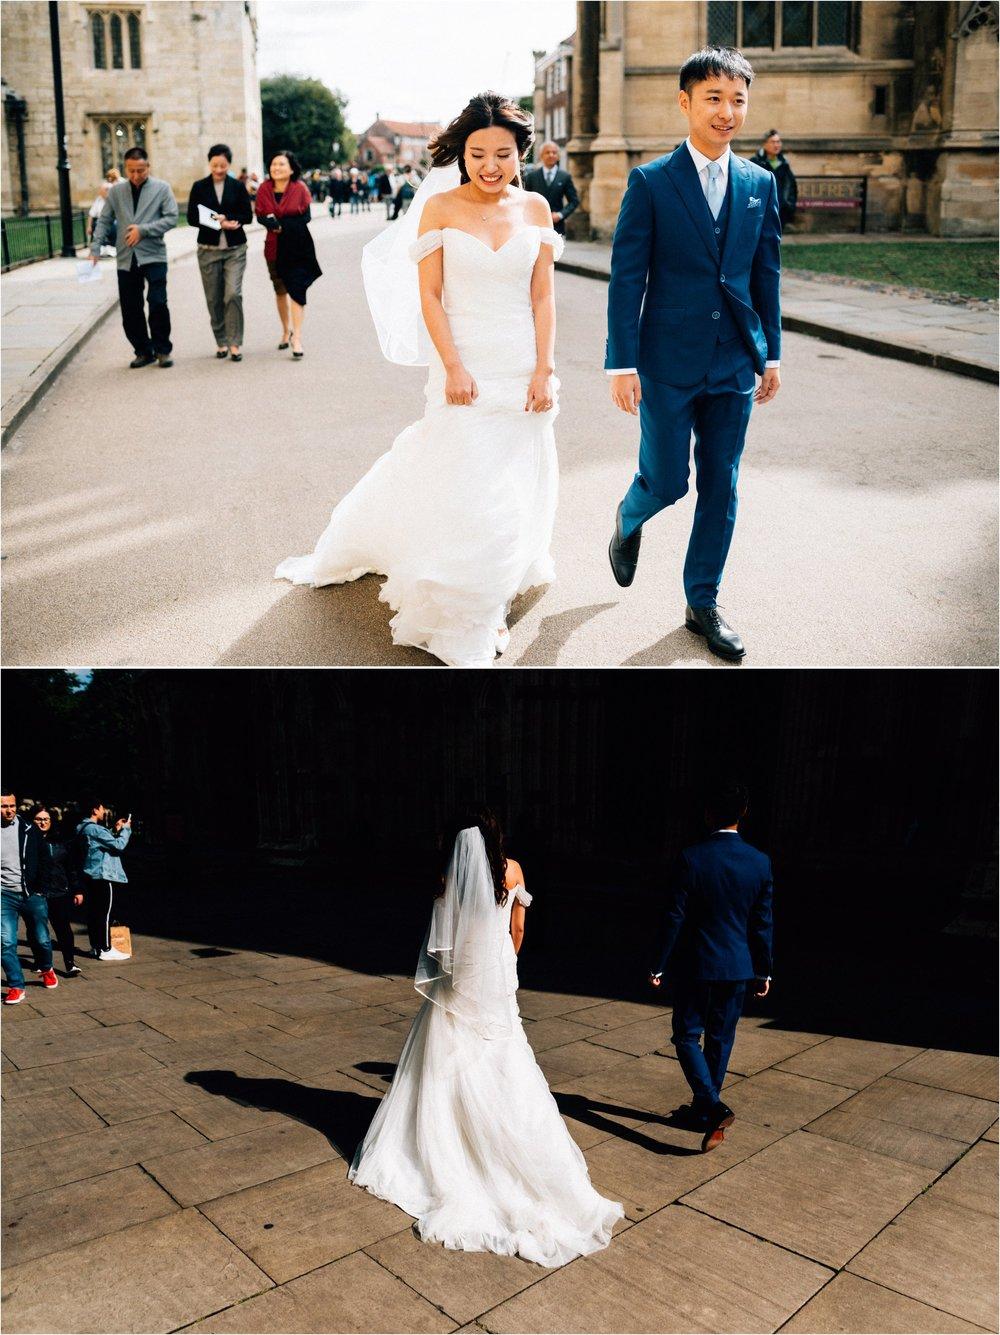 York city elopement wedding photographer_0150.jpg